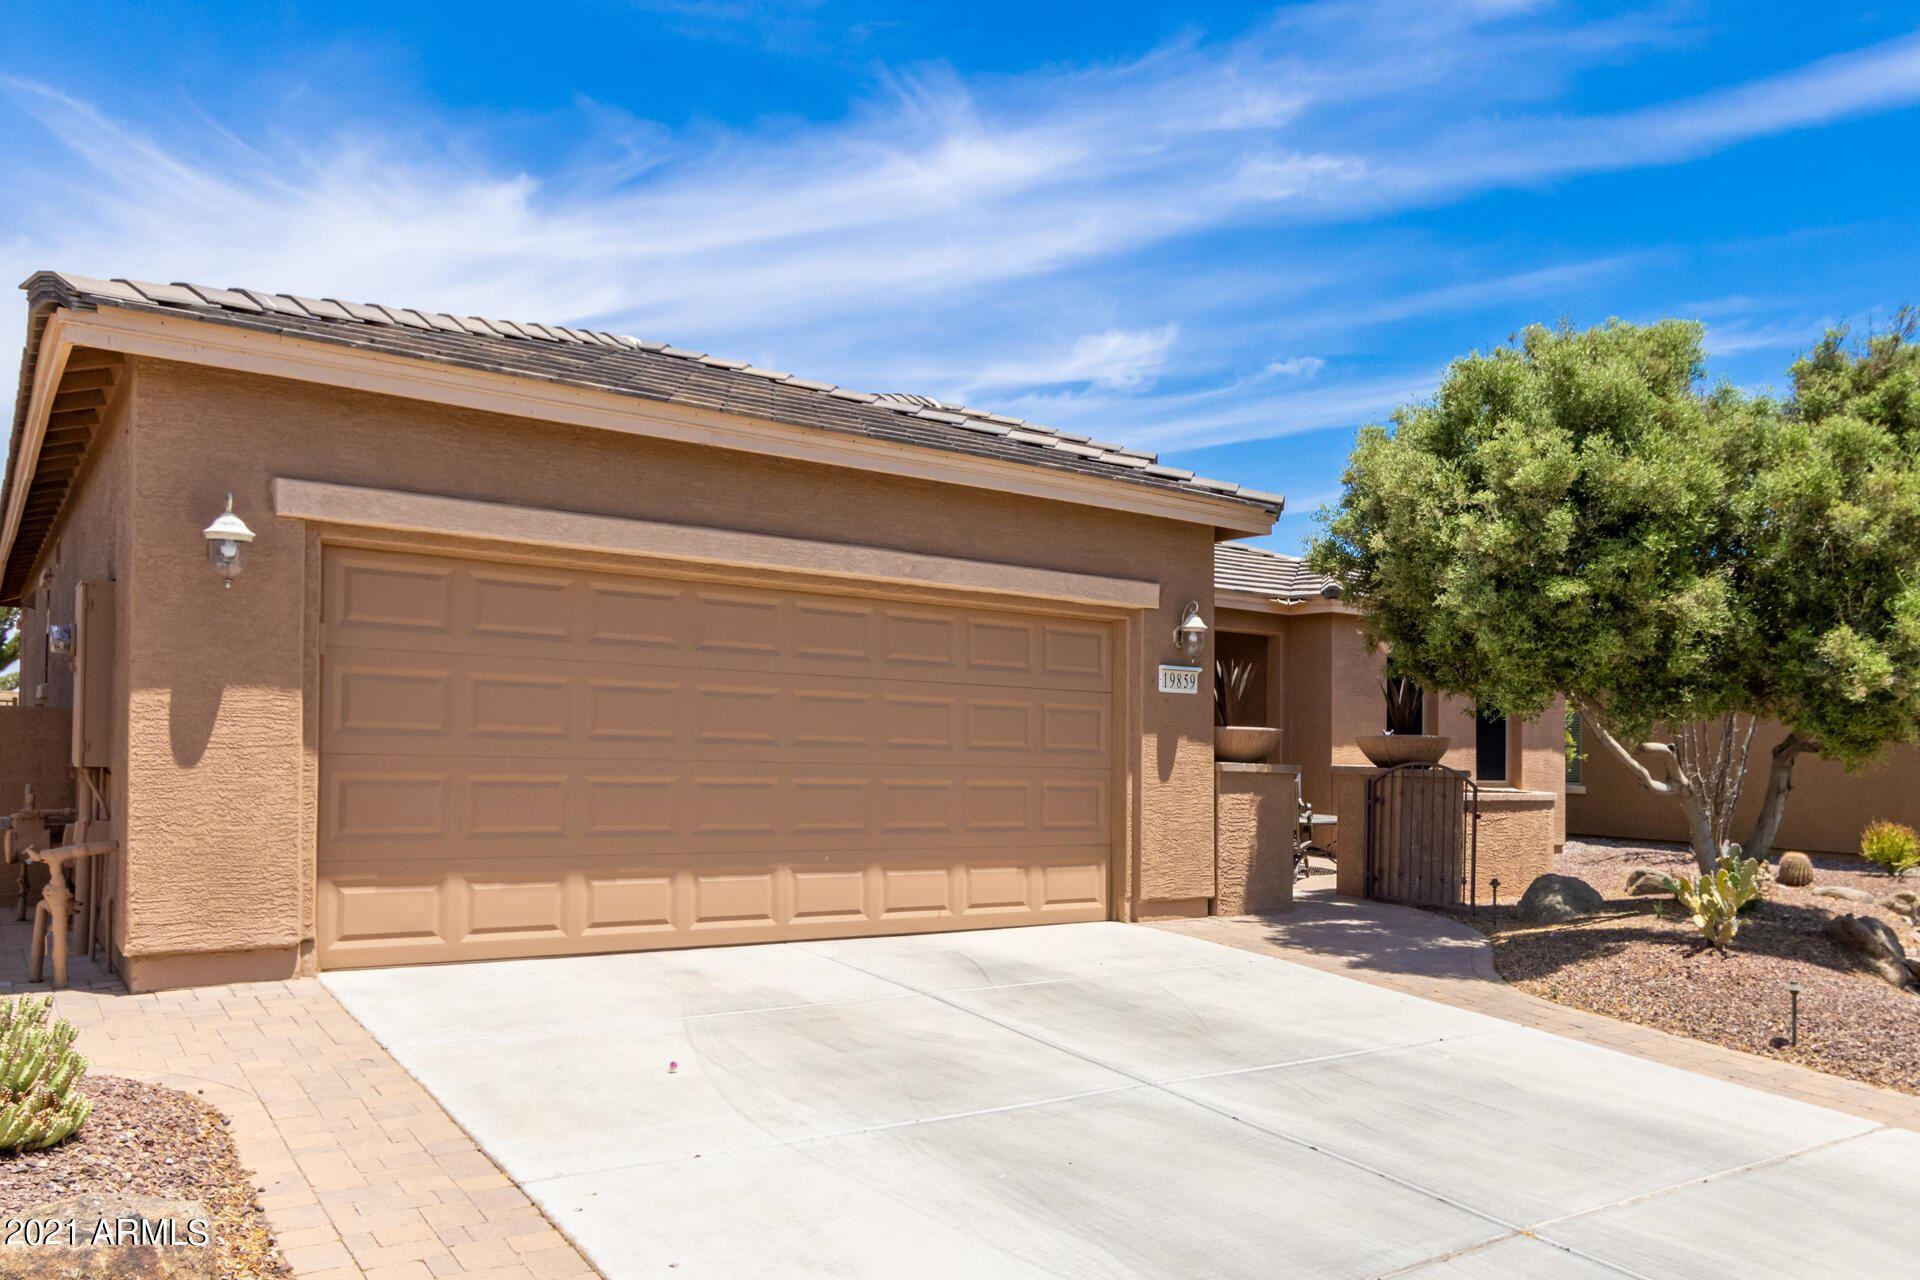 Photo of 19859 N SWAN Court, Maricopa, AZ 85138 (MLS # 6245939)